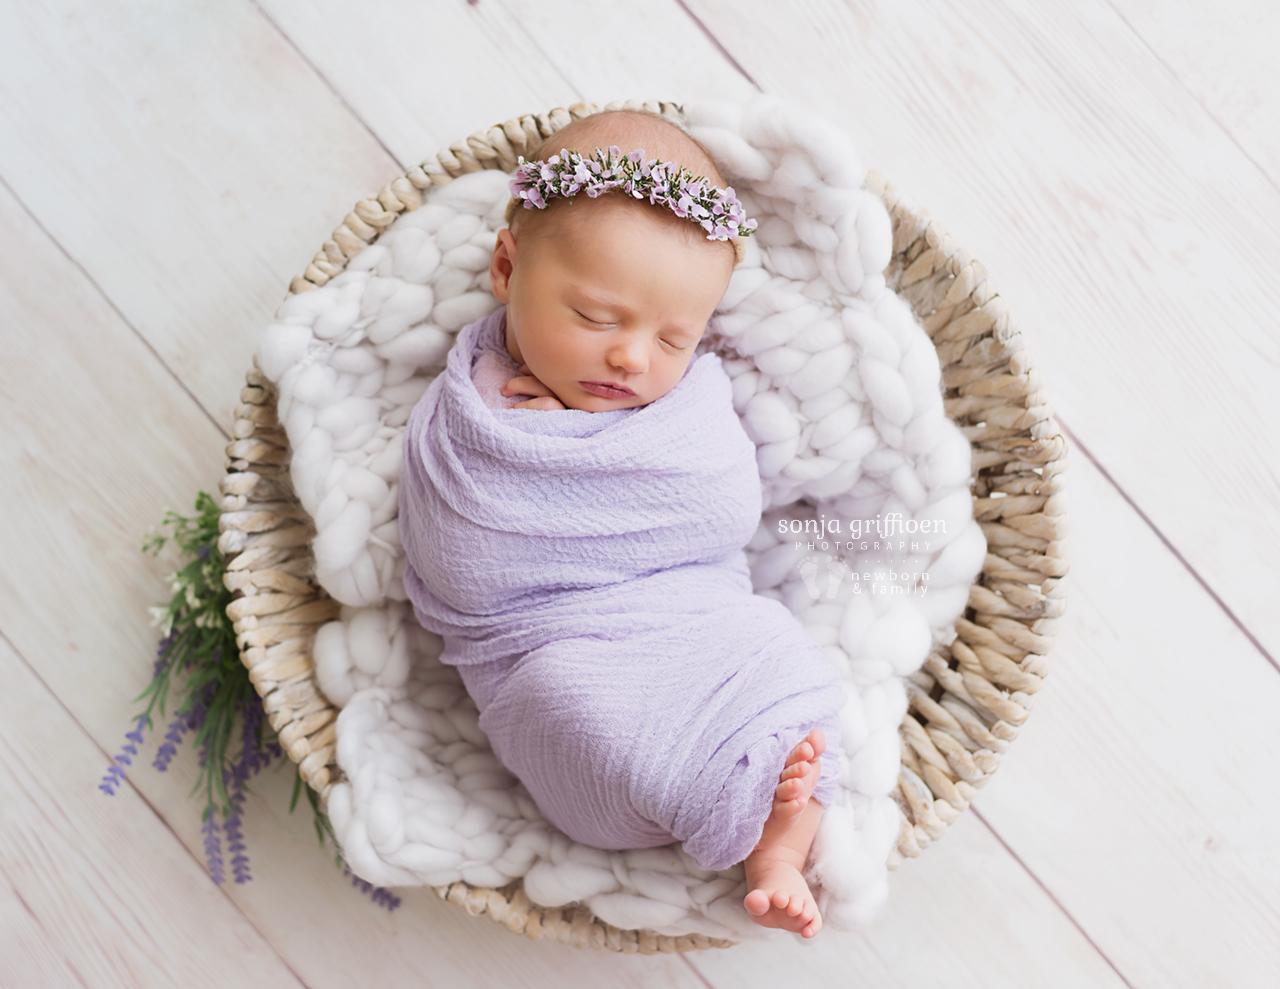 Macey-Newborn-Brisbane-Newborn-Photographer-Sonja-Griffioen-07b.jpg